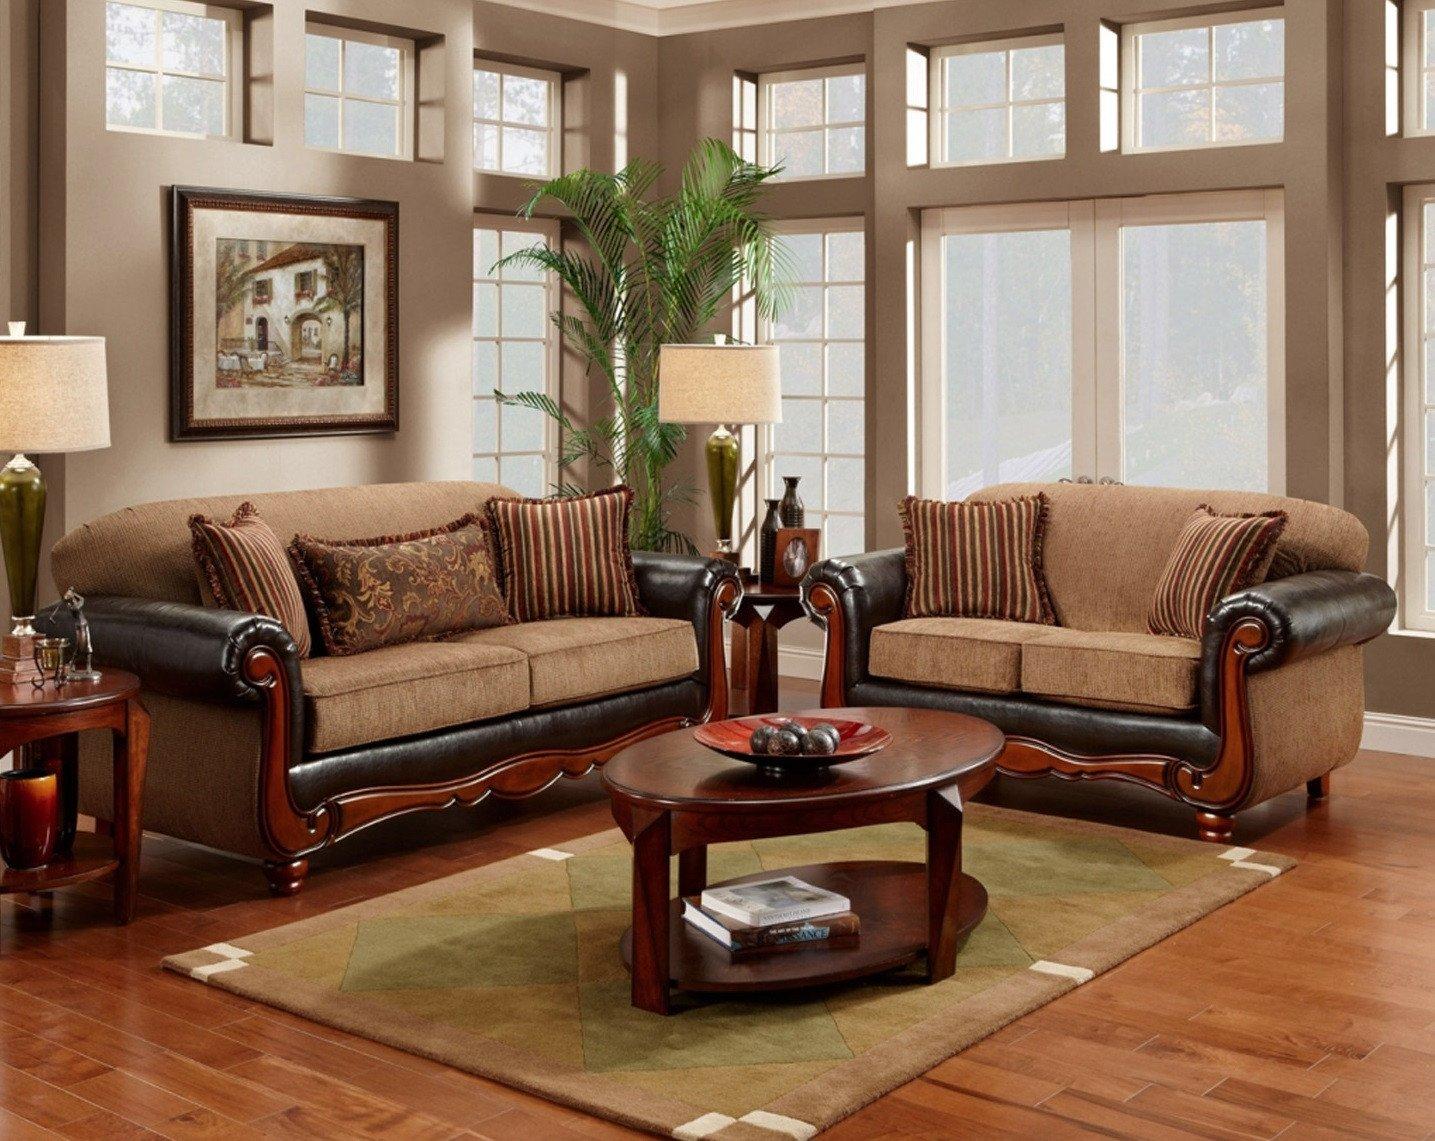 Living Room Furniture Ideas Beautiful Find Suitable Living Room Furniture with Your Style Amaza Design